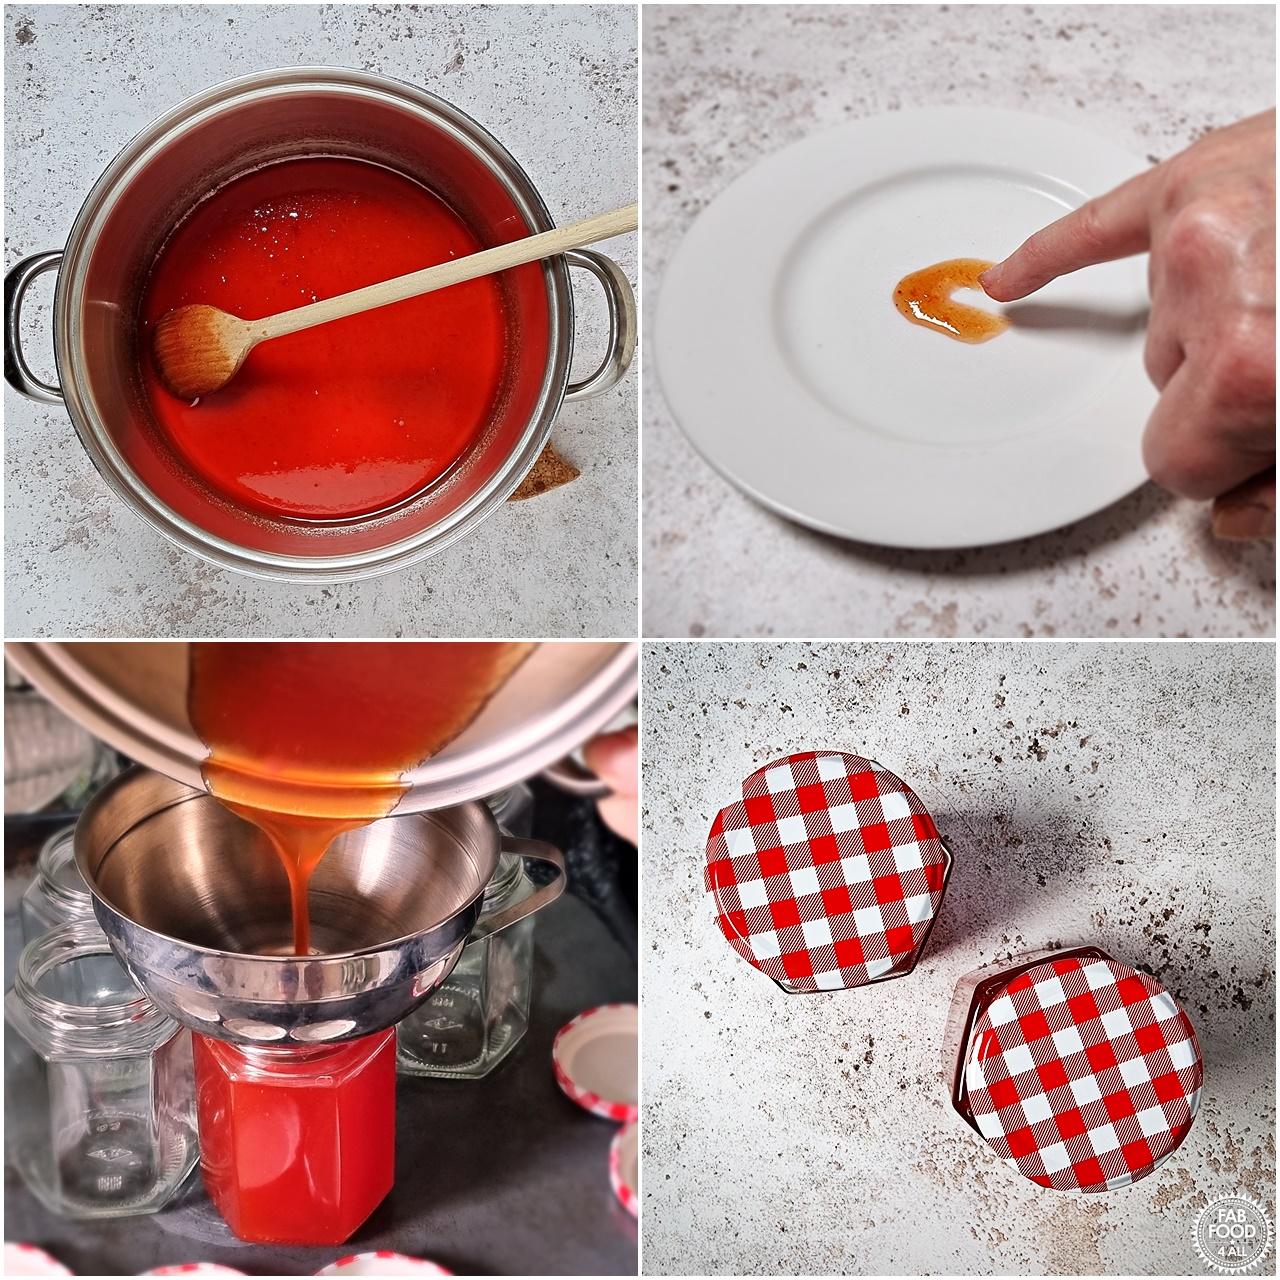 How to make Watermelon Jam shots 10 - 14